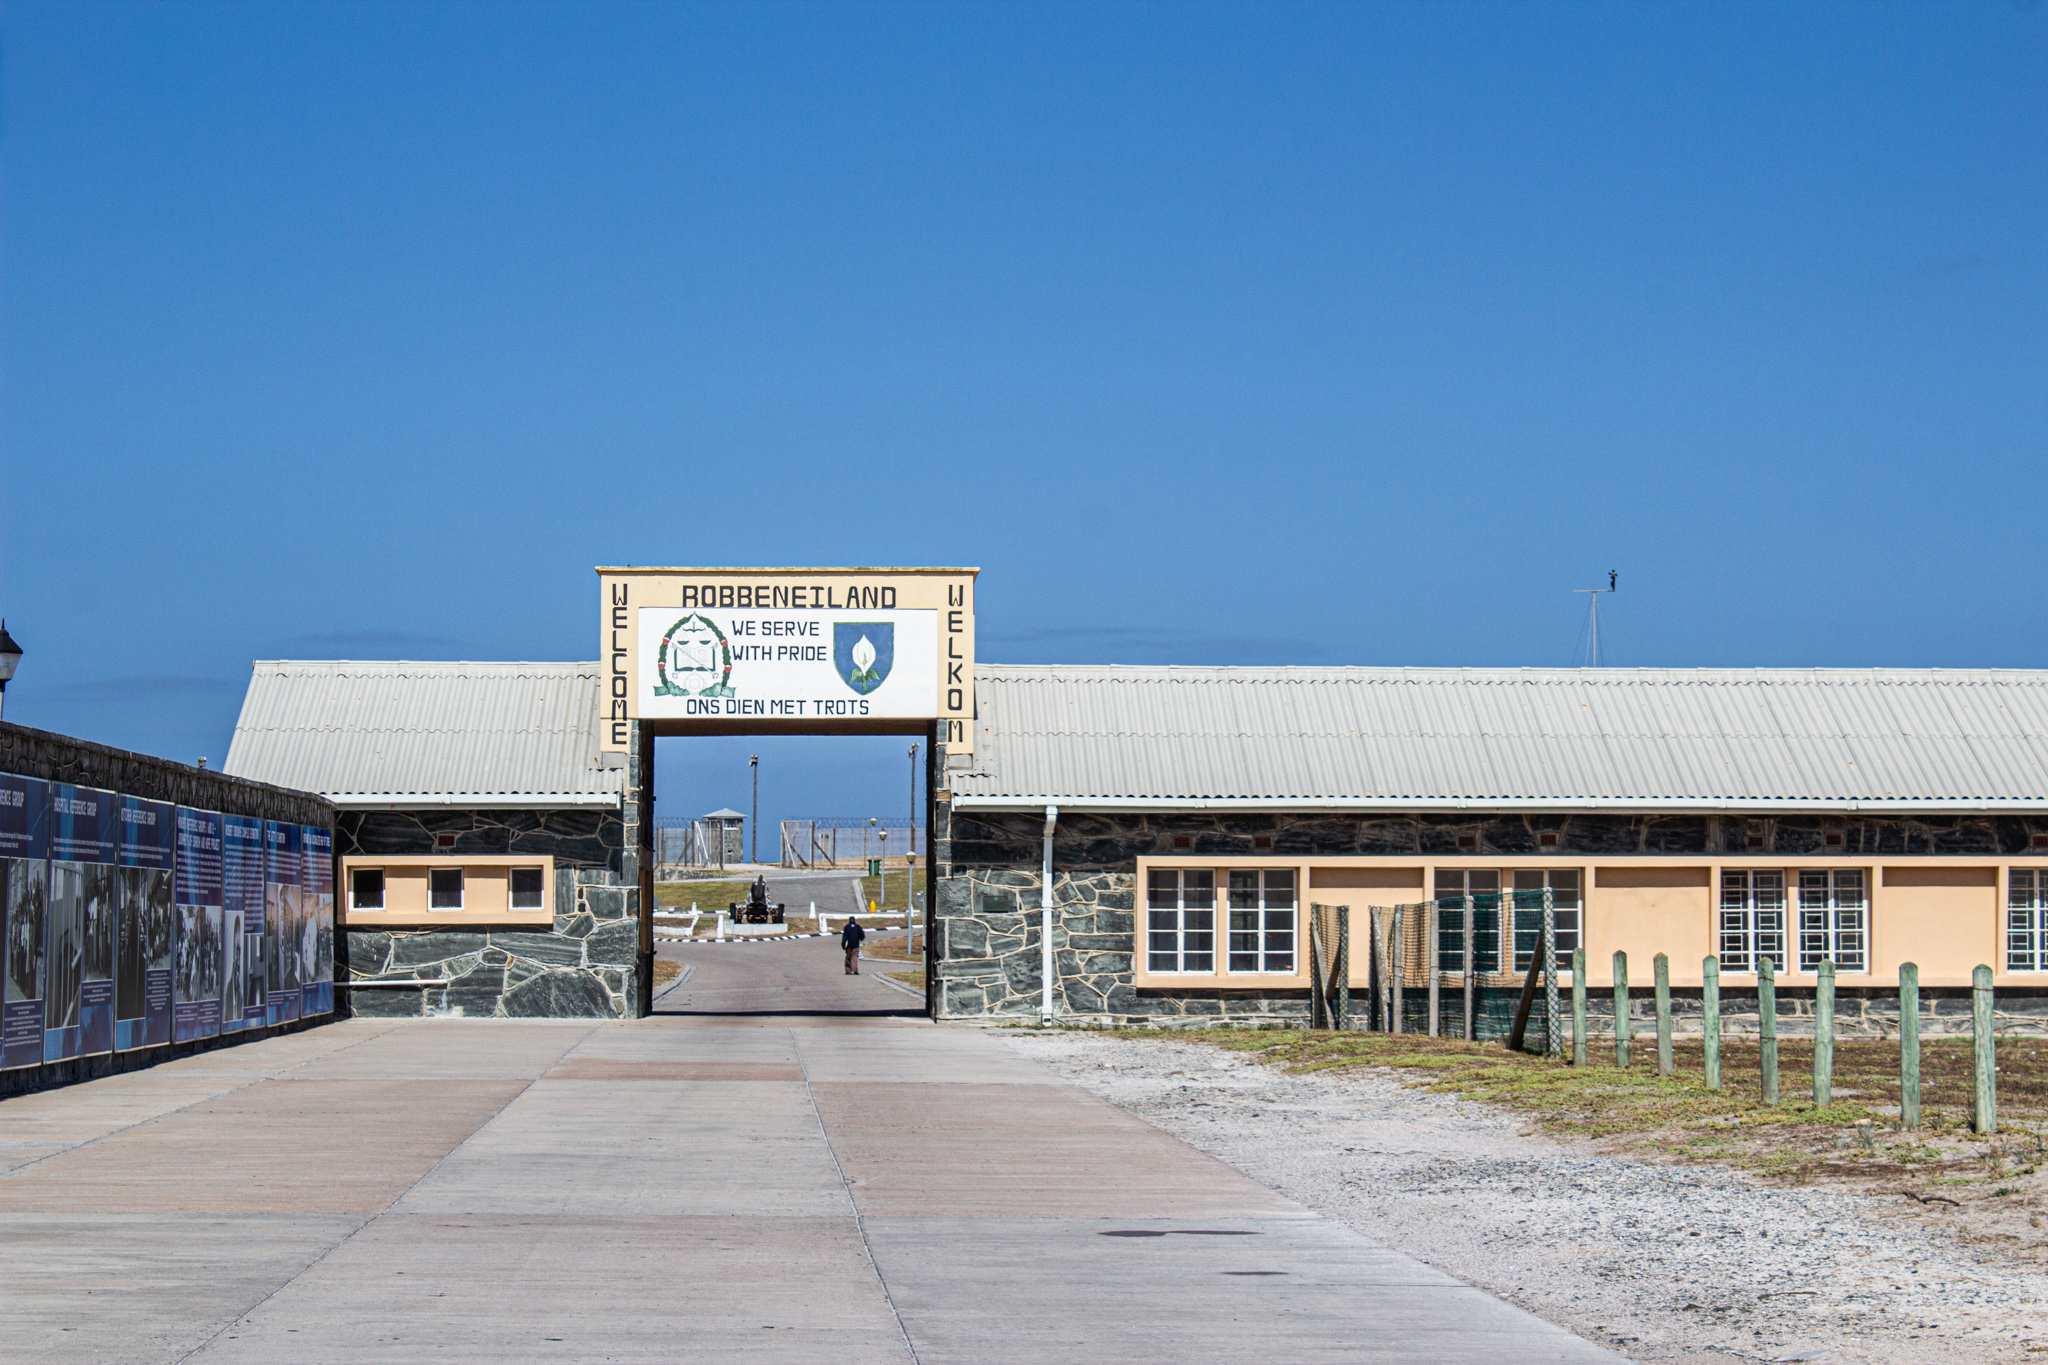 entrance to robben island, a yellow building